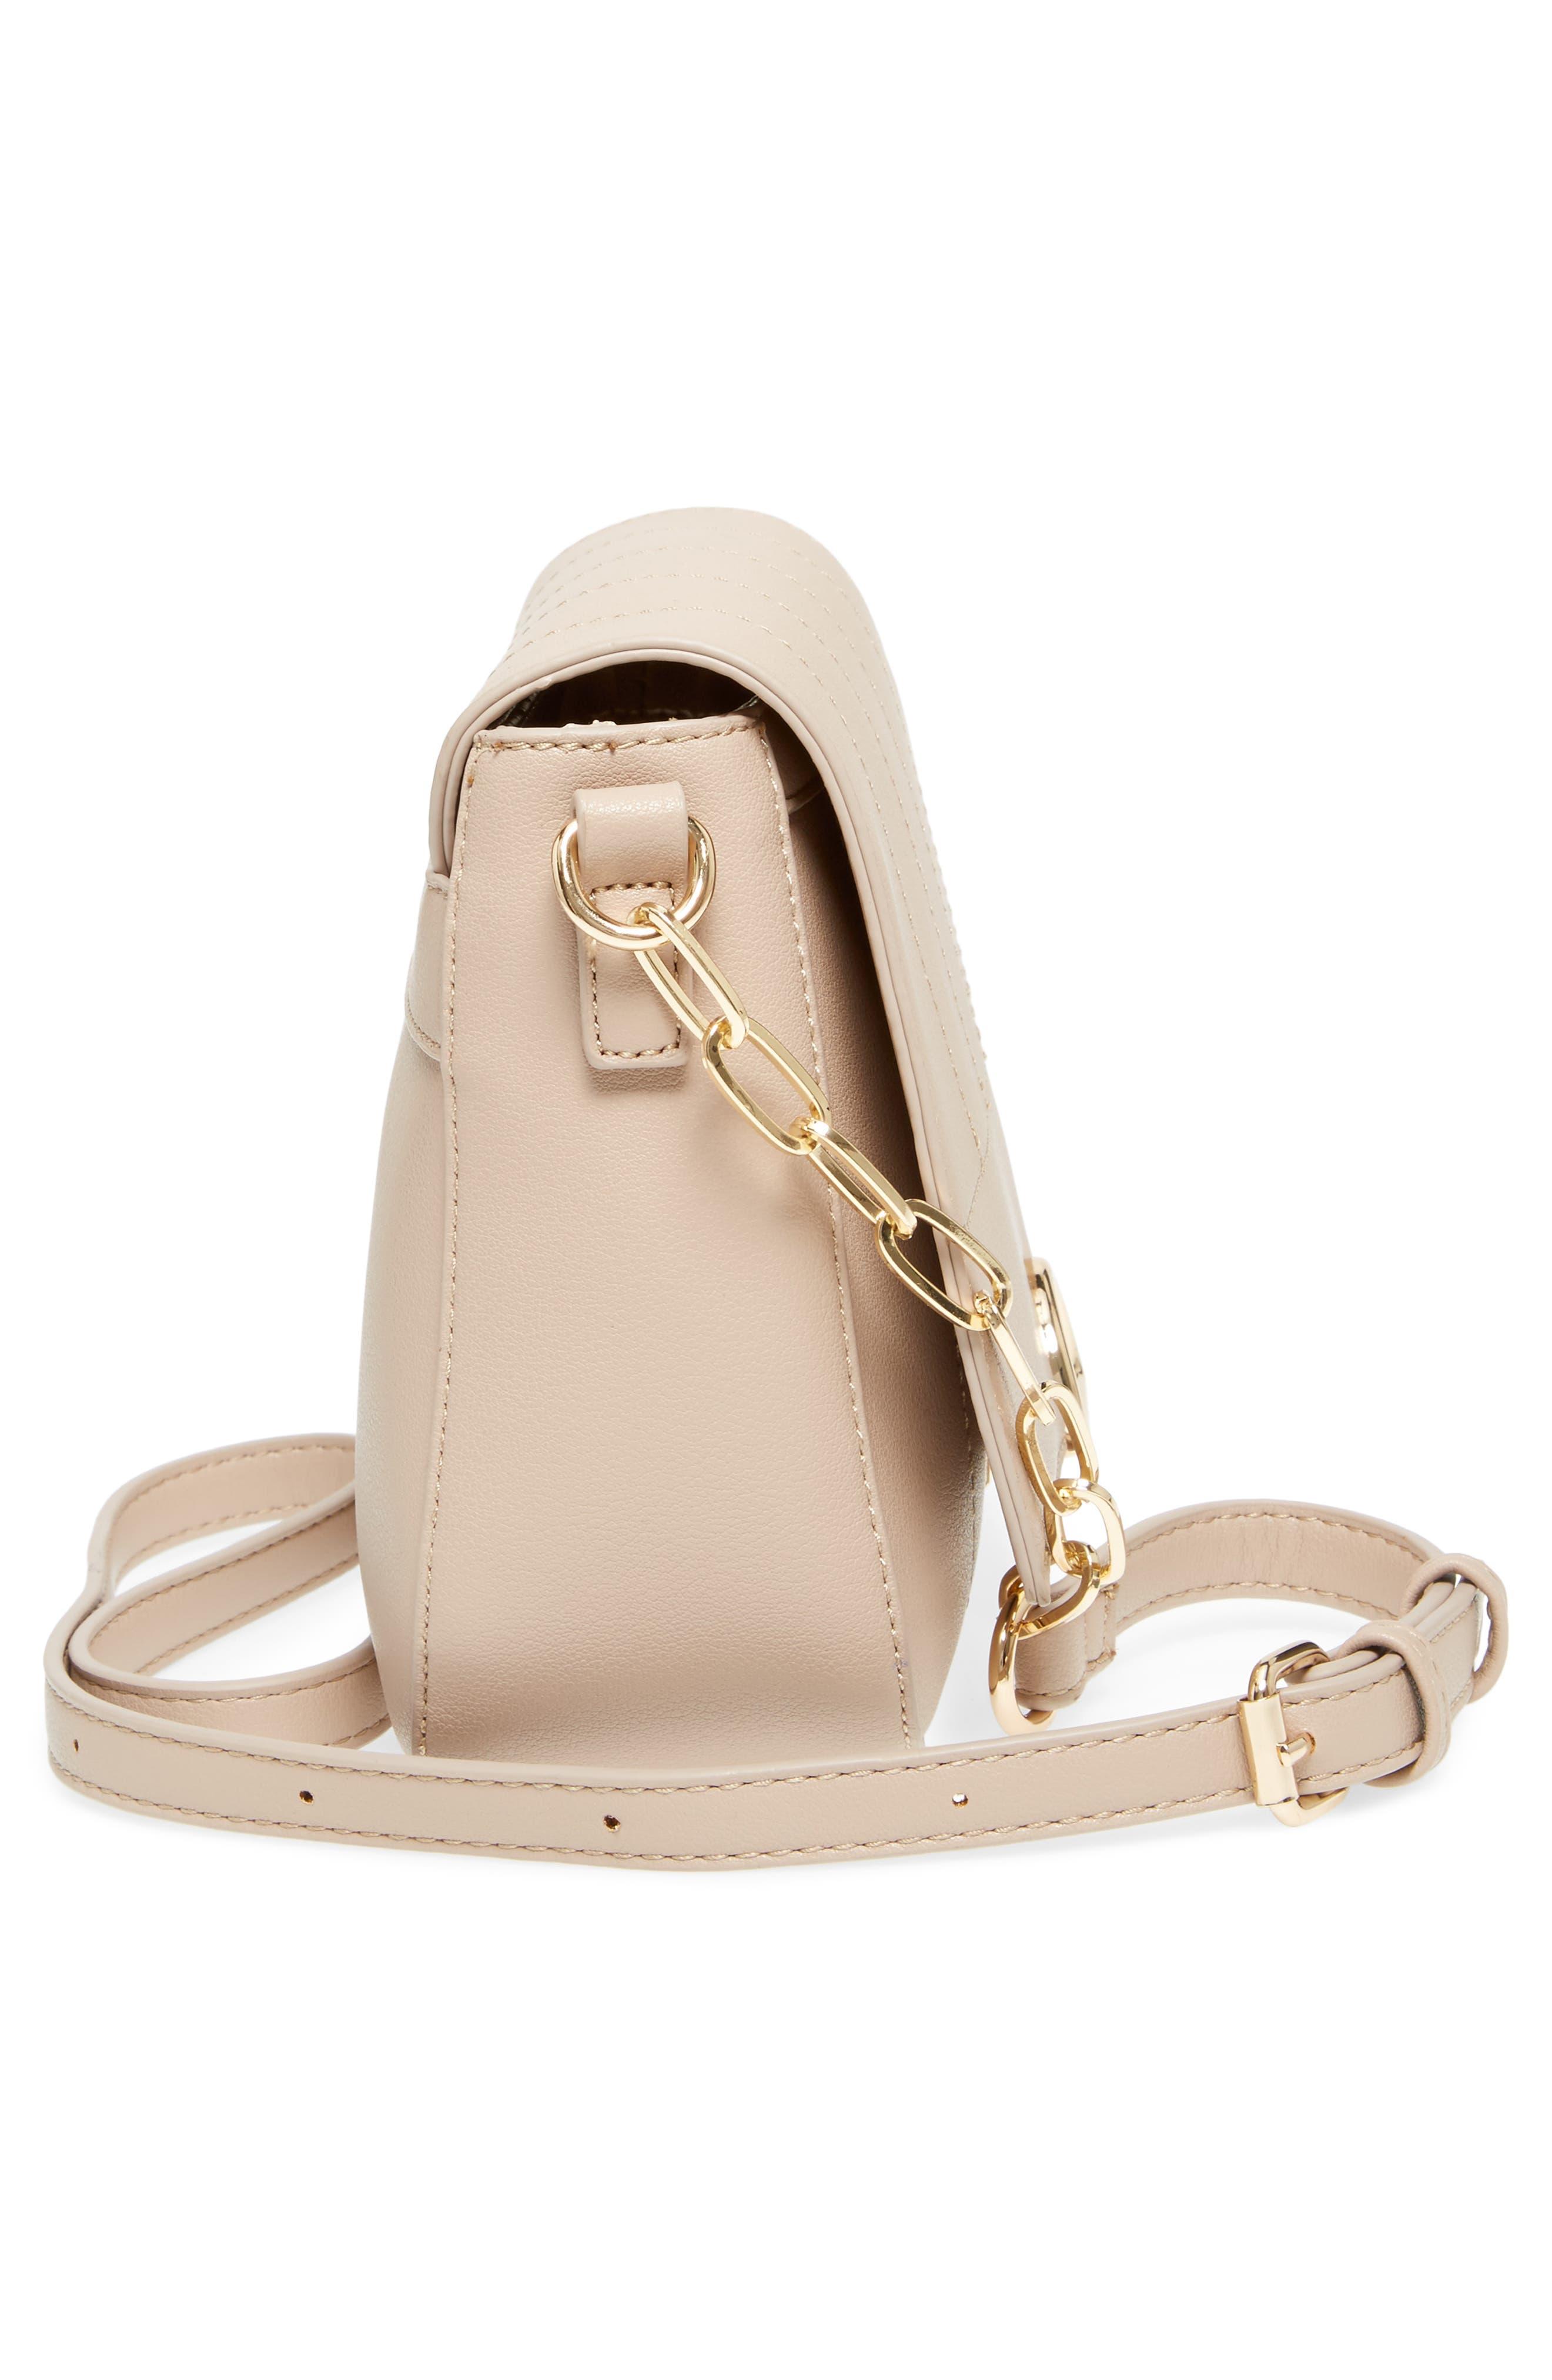 Colie Faux Leather Crossbody Bag,                             Alternate thumbnail 14, color,